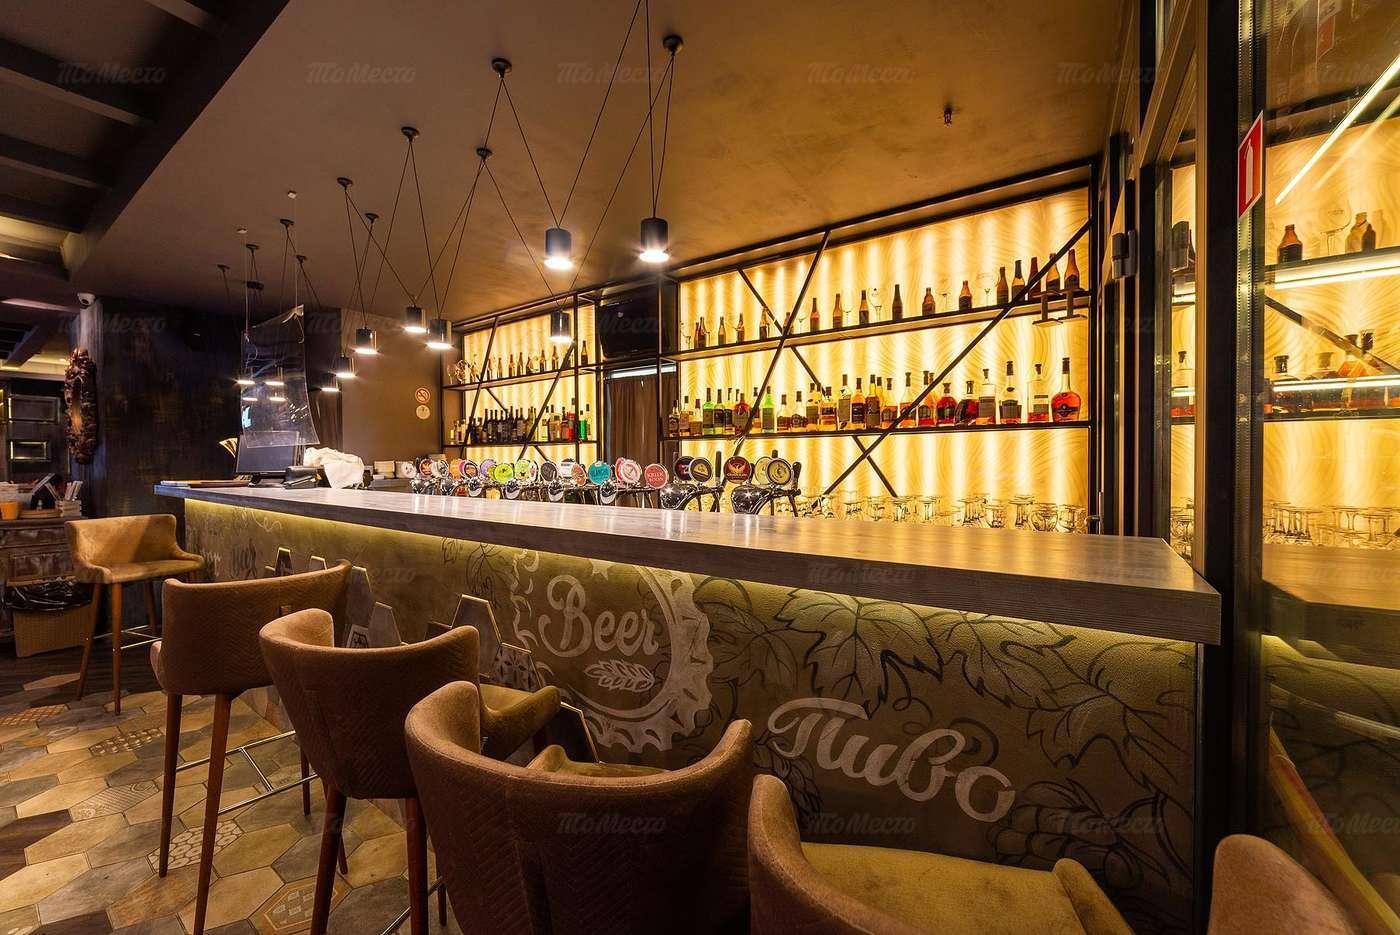 Ресторан Брассерия Крик (Brasserie Kriek) на Коломяжском проспекте фото 3